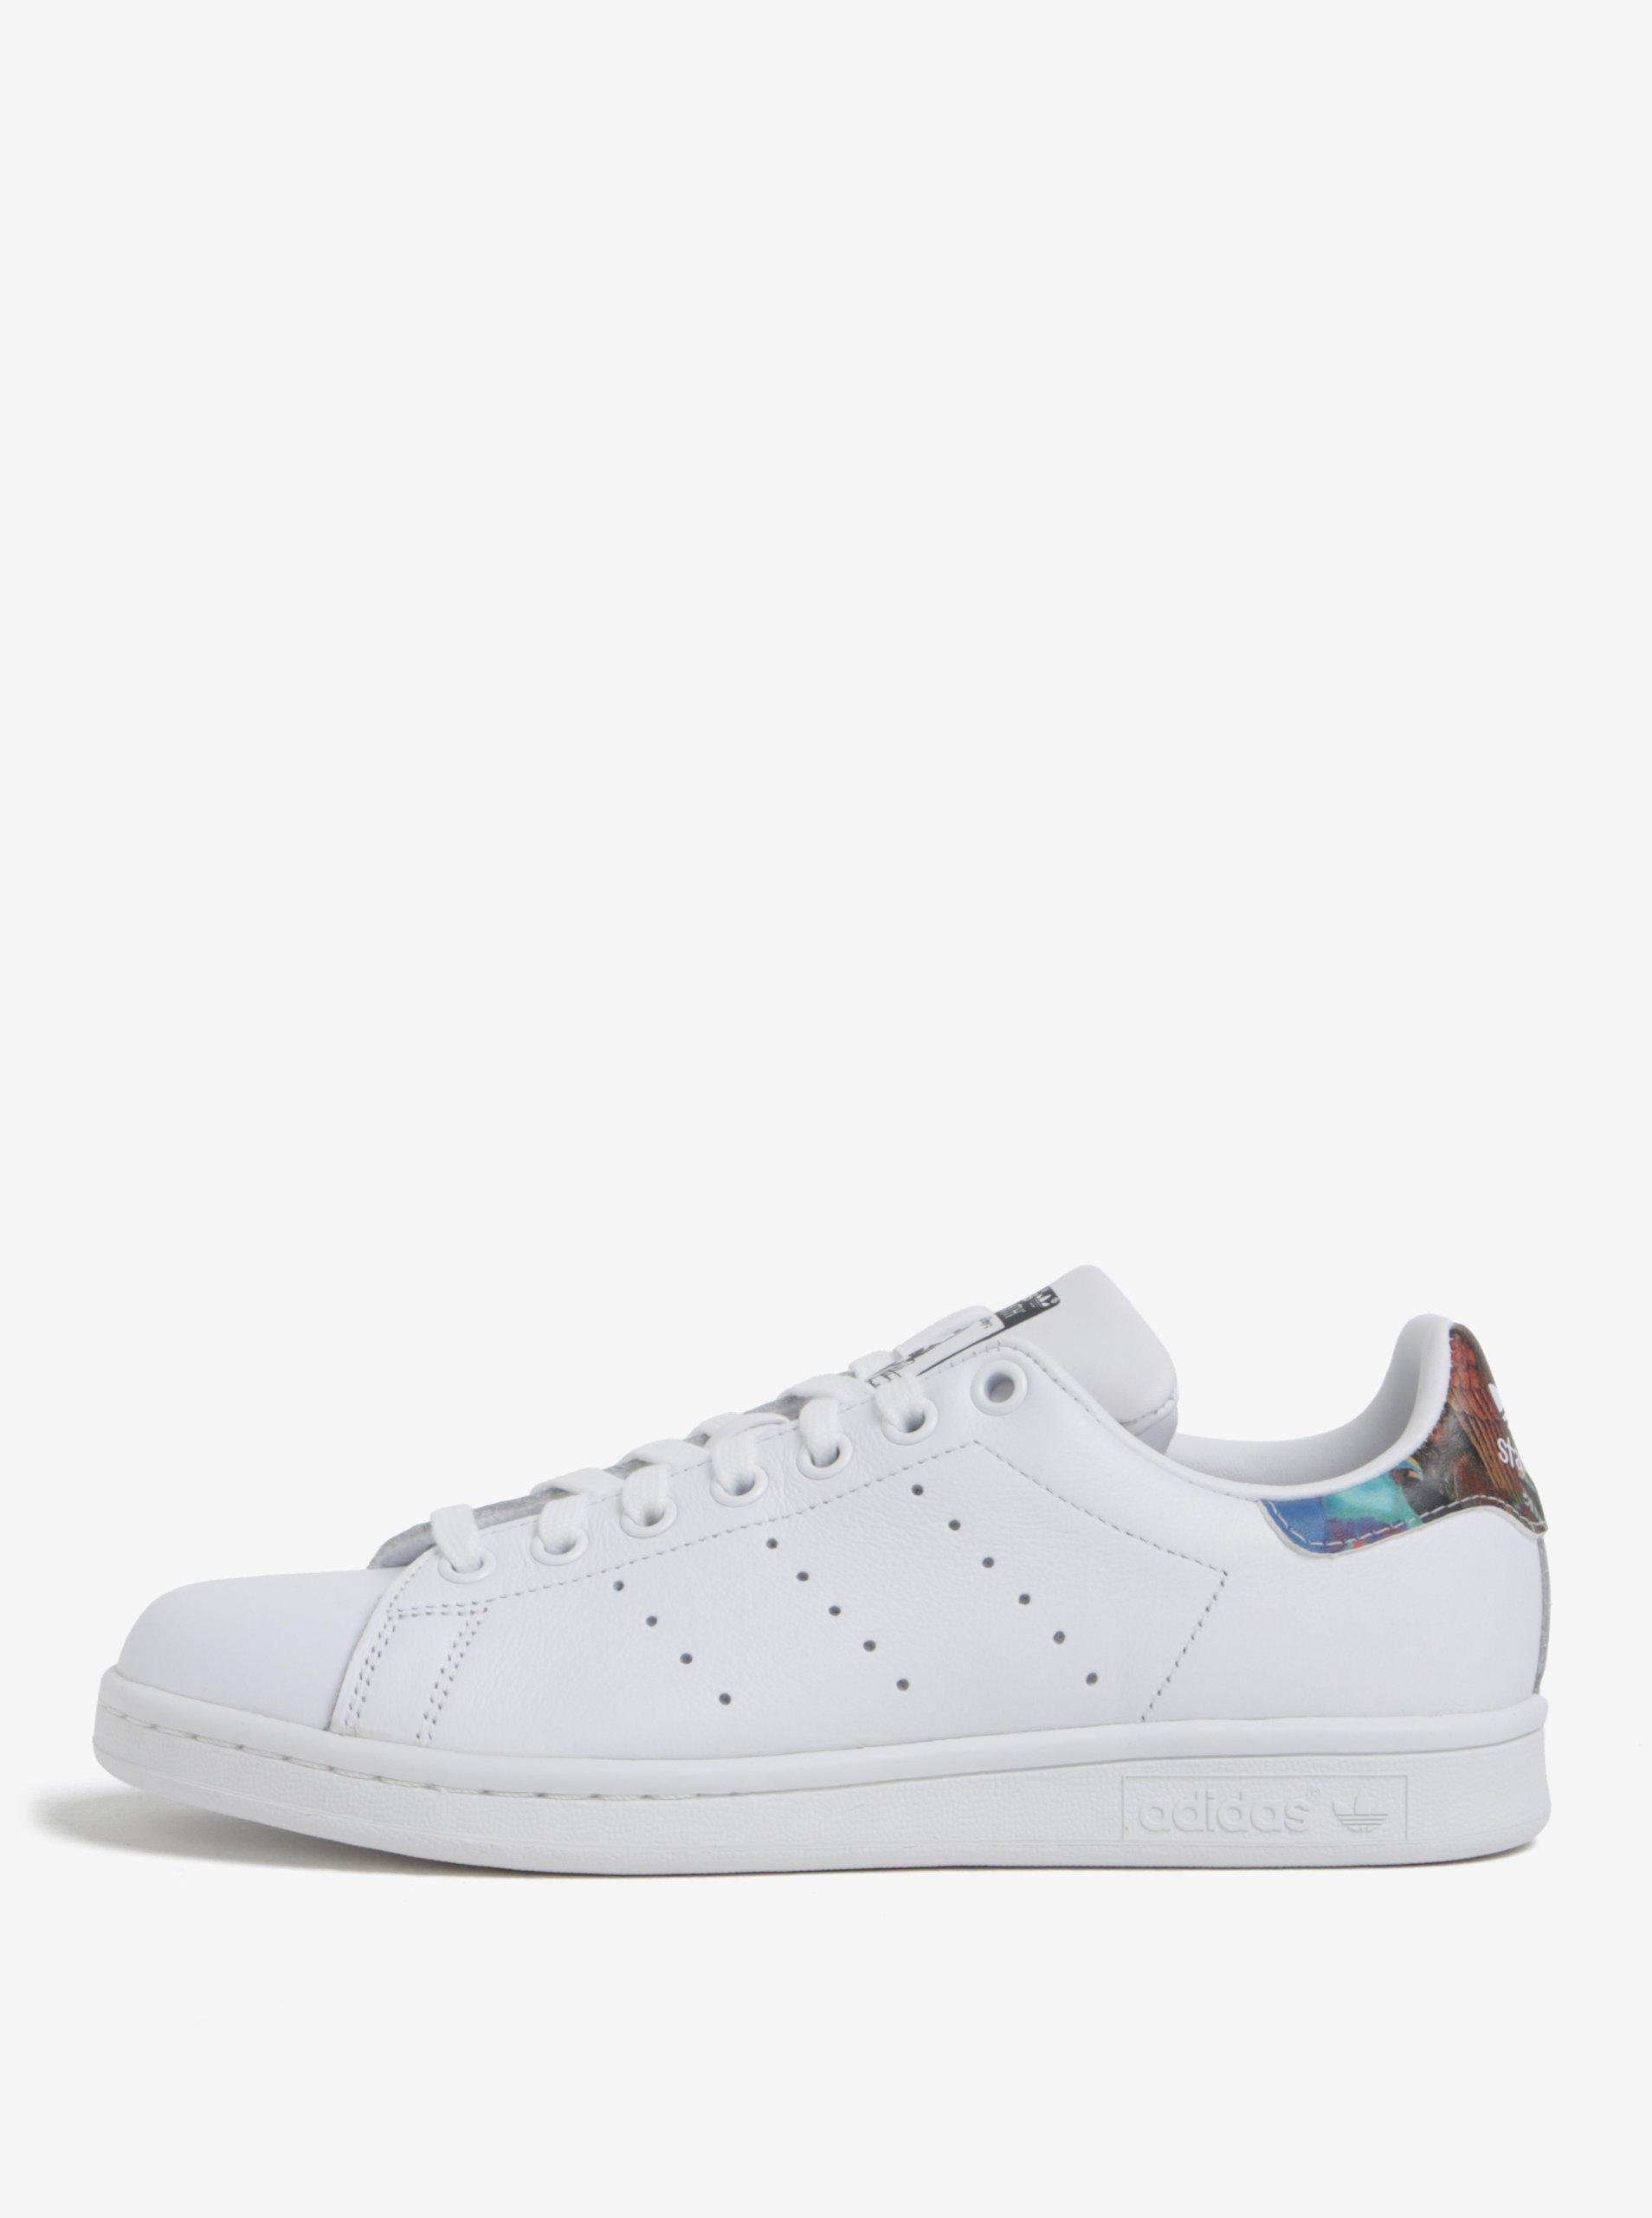 Biele dámske tenisky s farebným detailom adidas Originals Stan Smith ... 0b49054b38